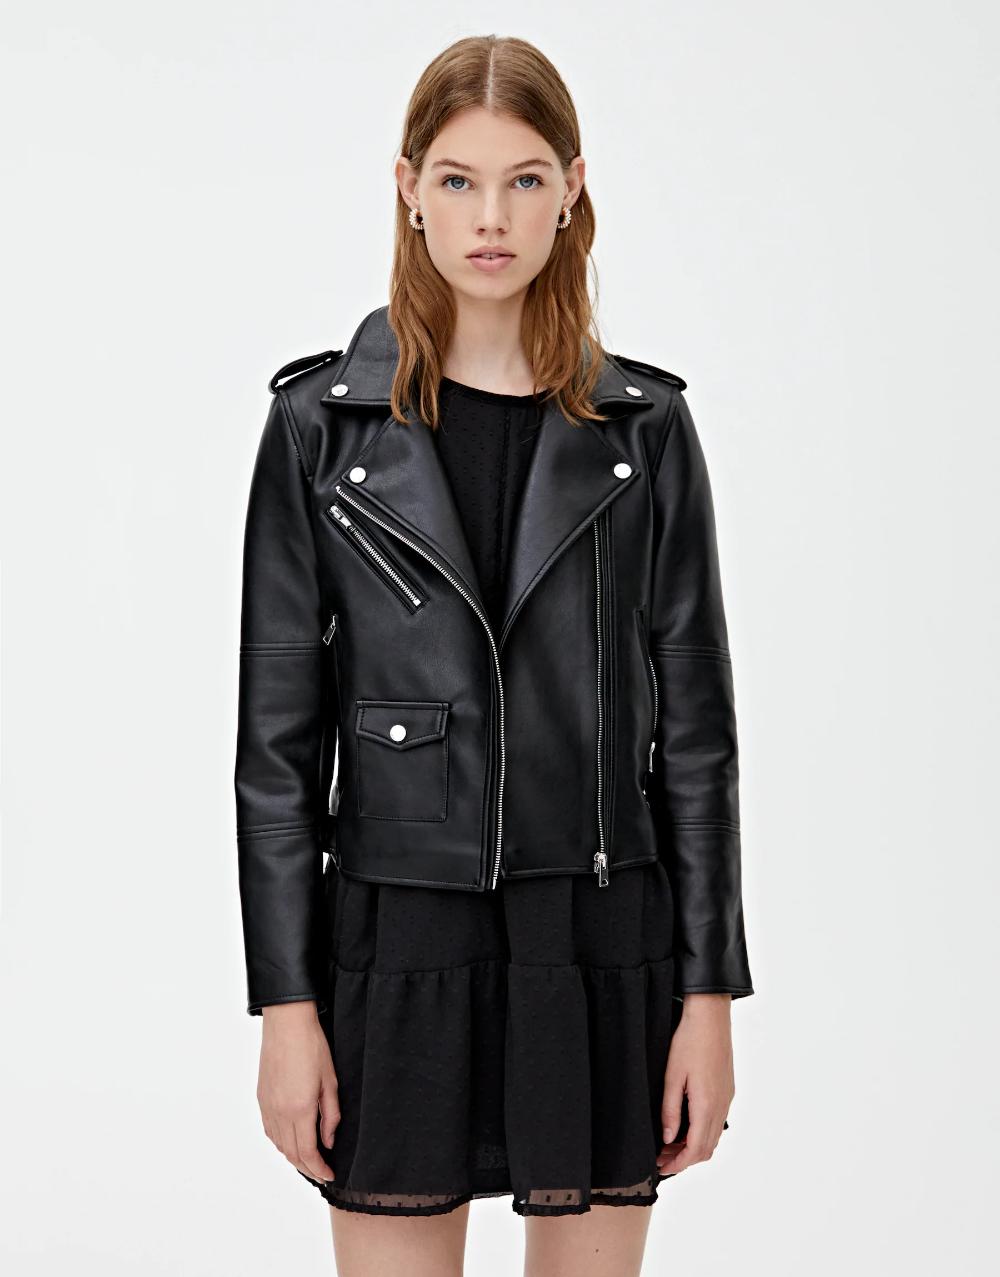 CAZADORA BIKER PU PLUS PULL&BEAR Black biker jacket